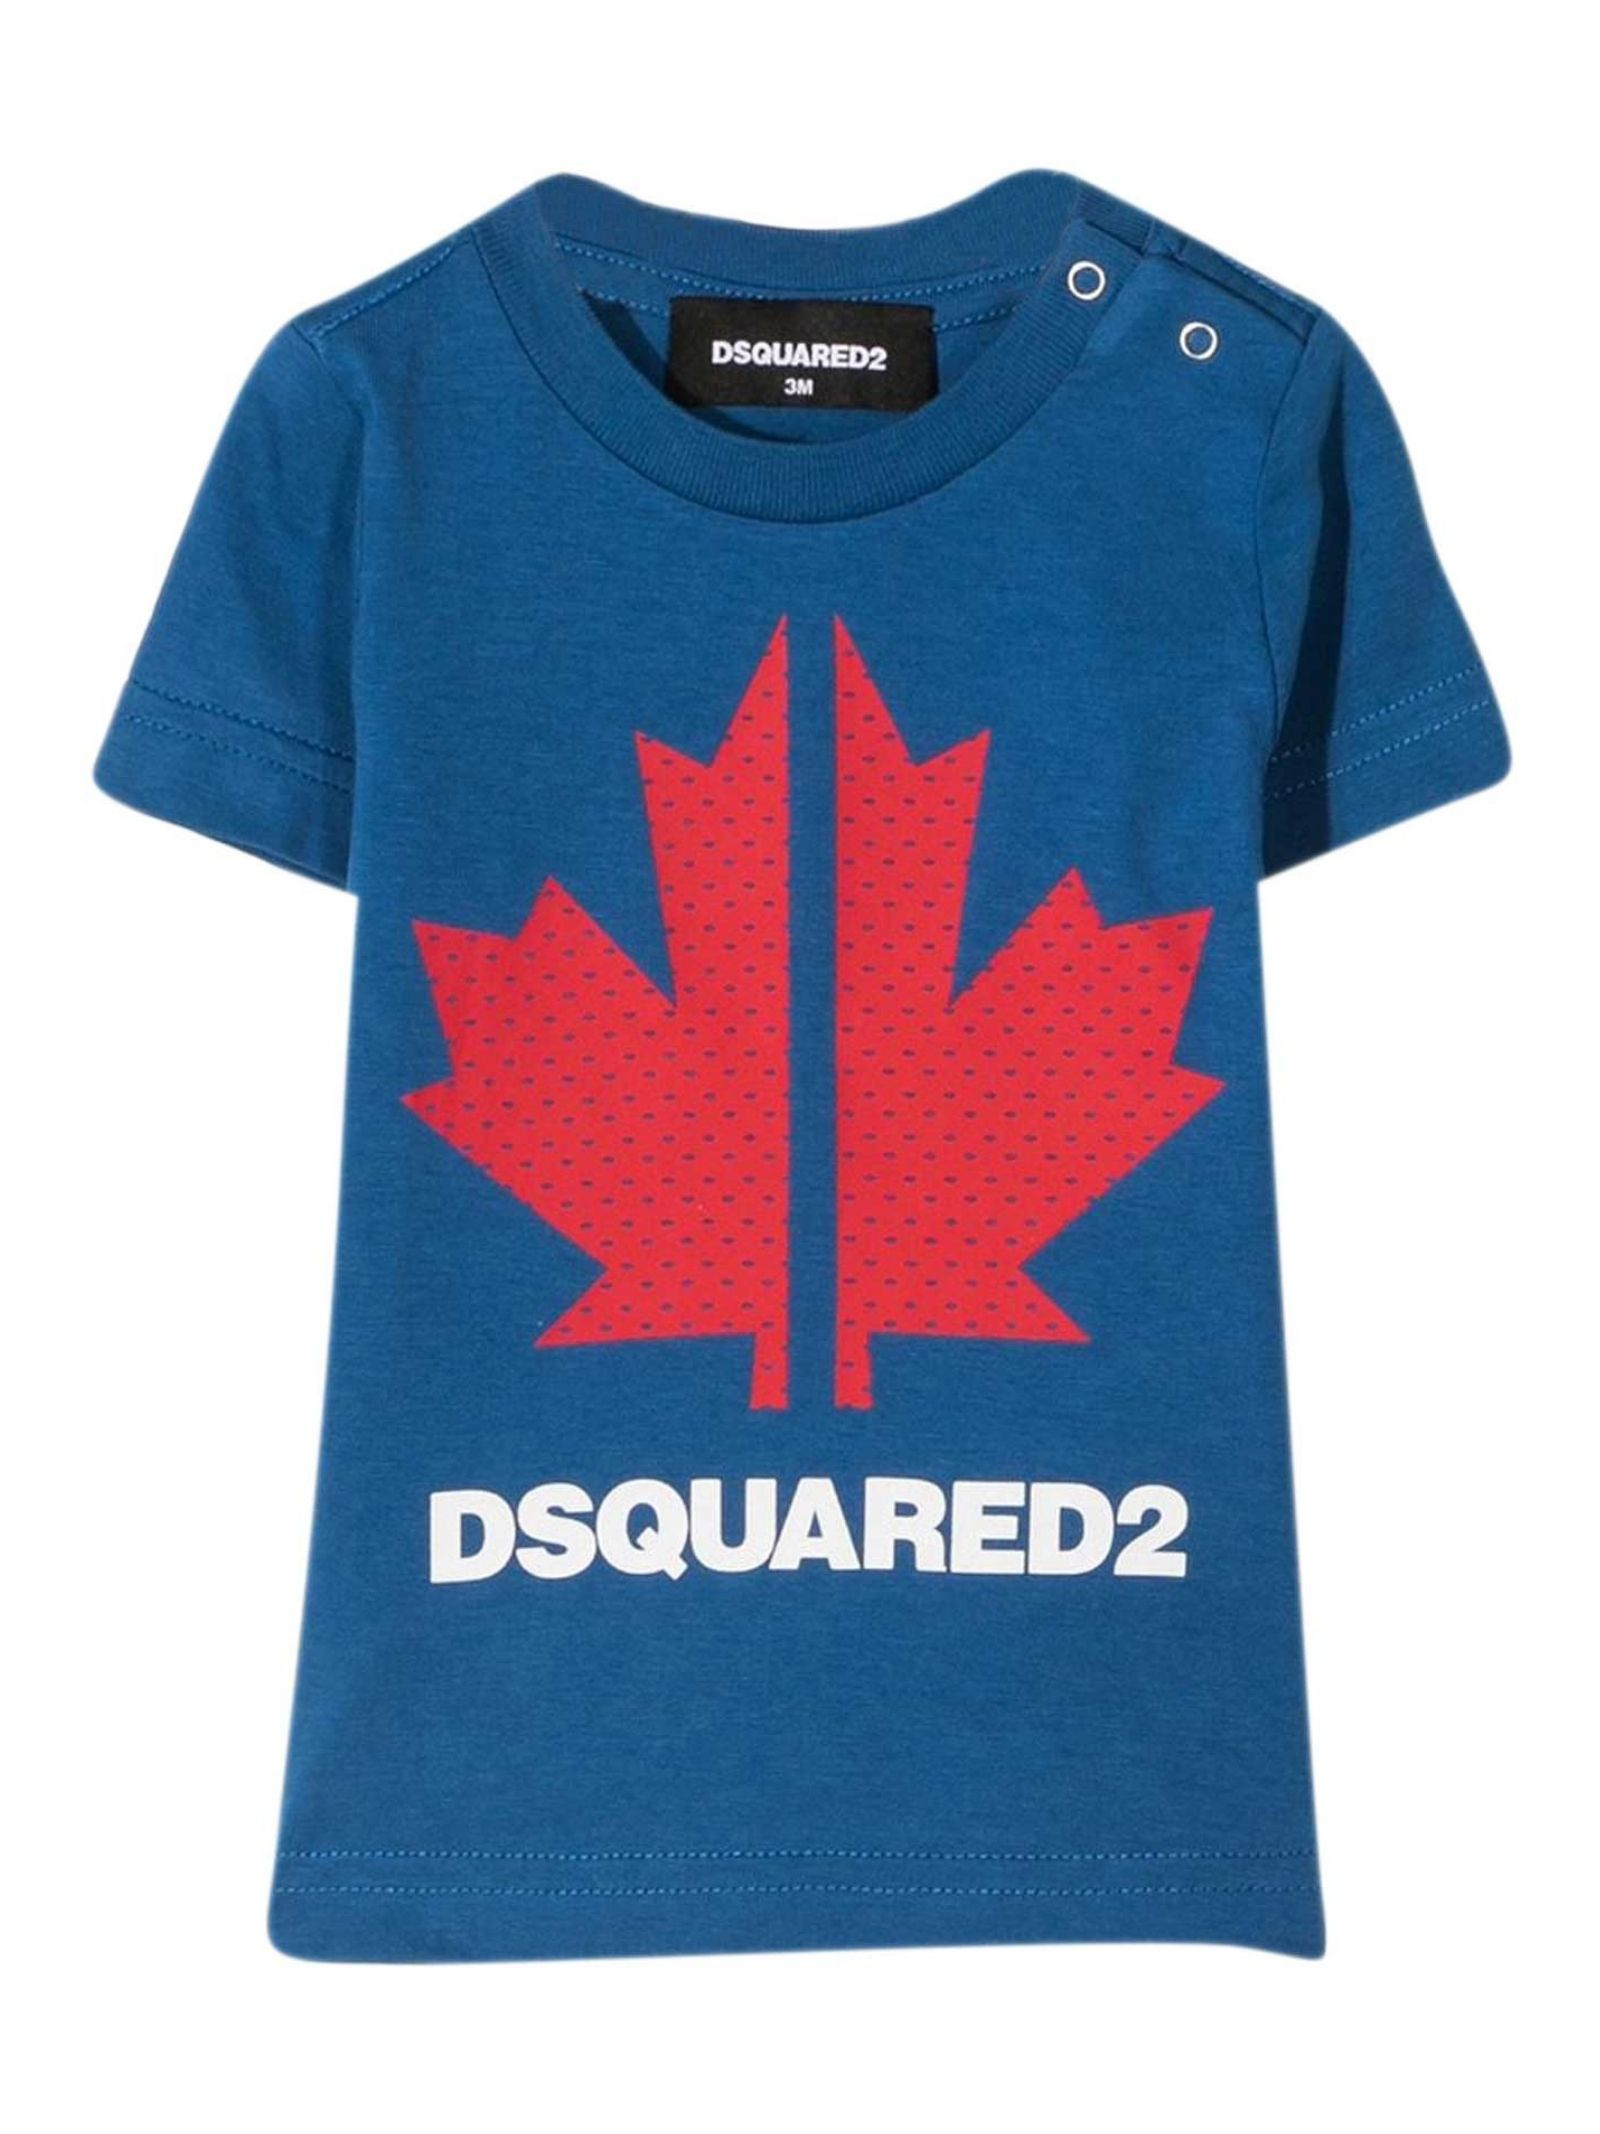 DSQUARED | T-shirt | DQ0029 D004GDQ868